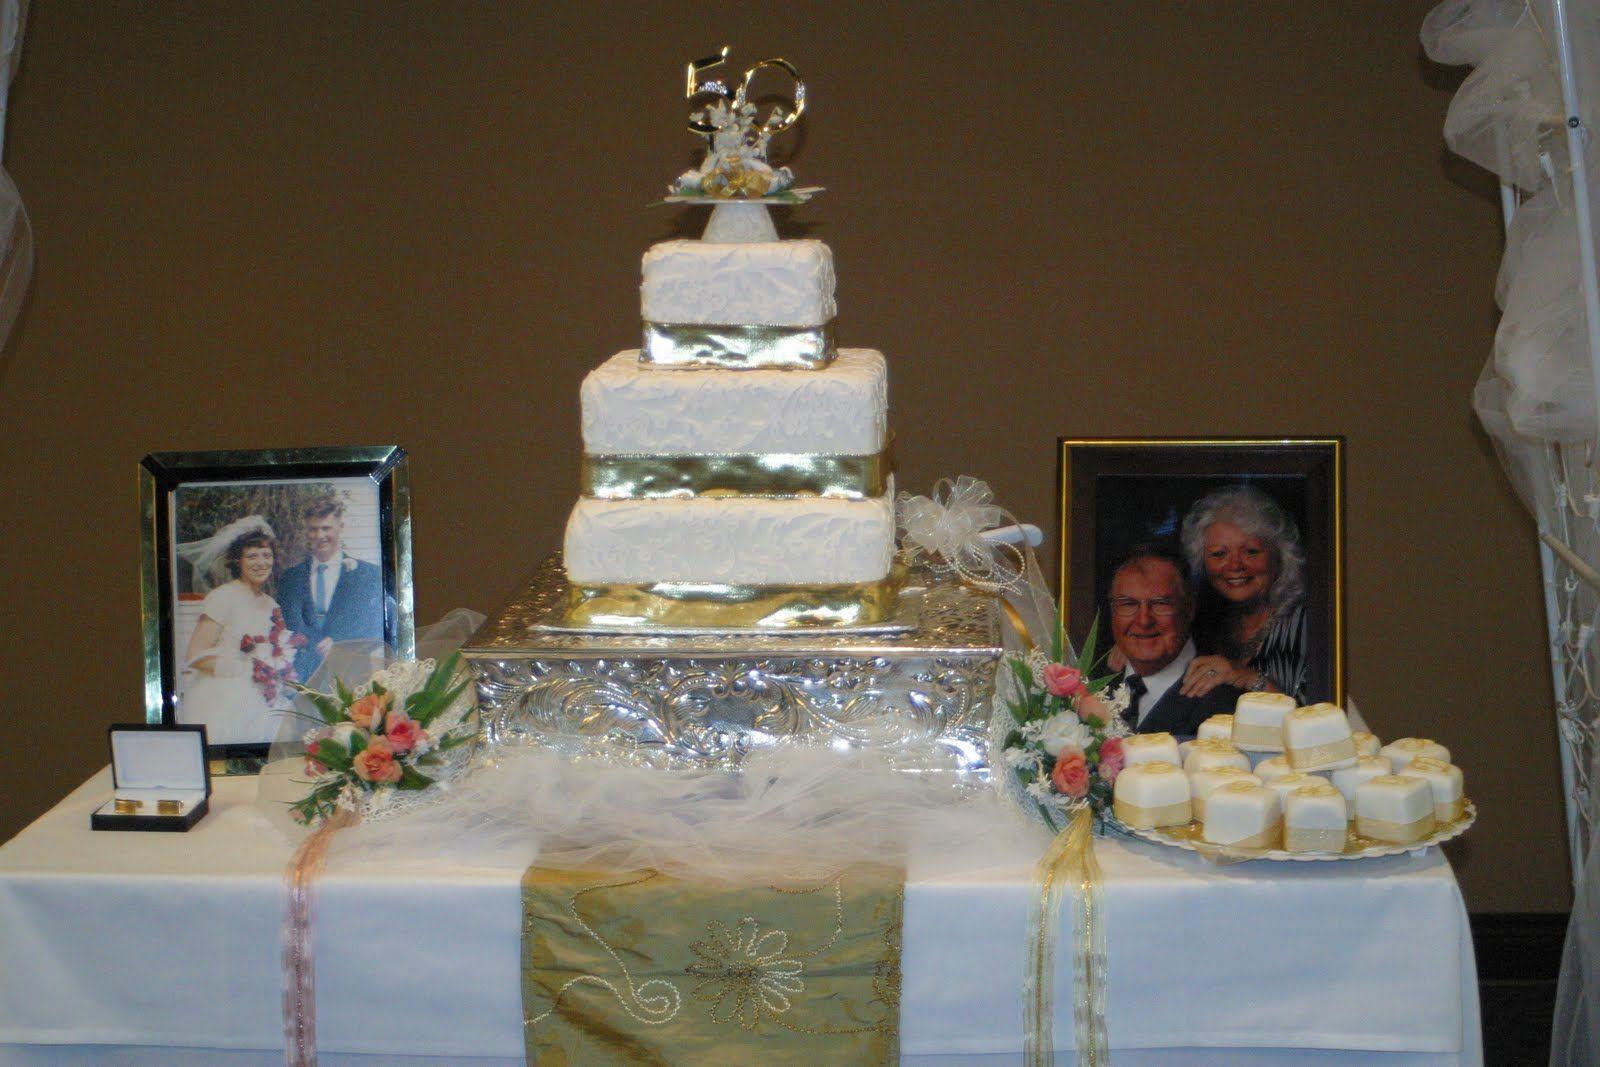 Decoration ideas for 50th wedding anniversary celebration  Imagen relacionada  TORTA MASHA  Pinterest  Wedding anniversary